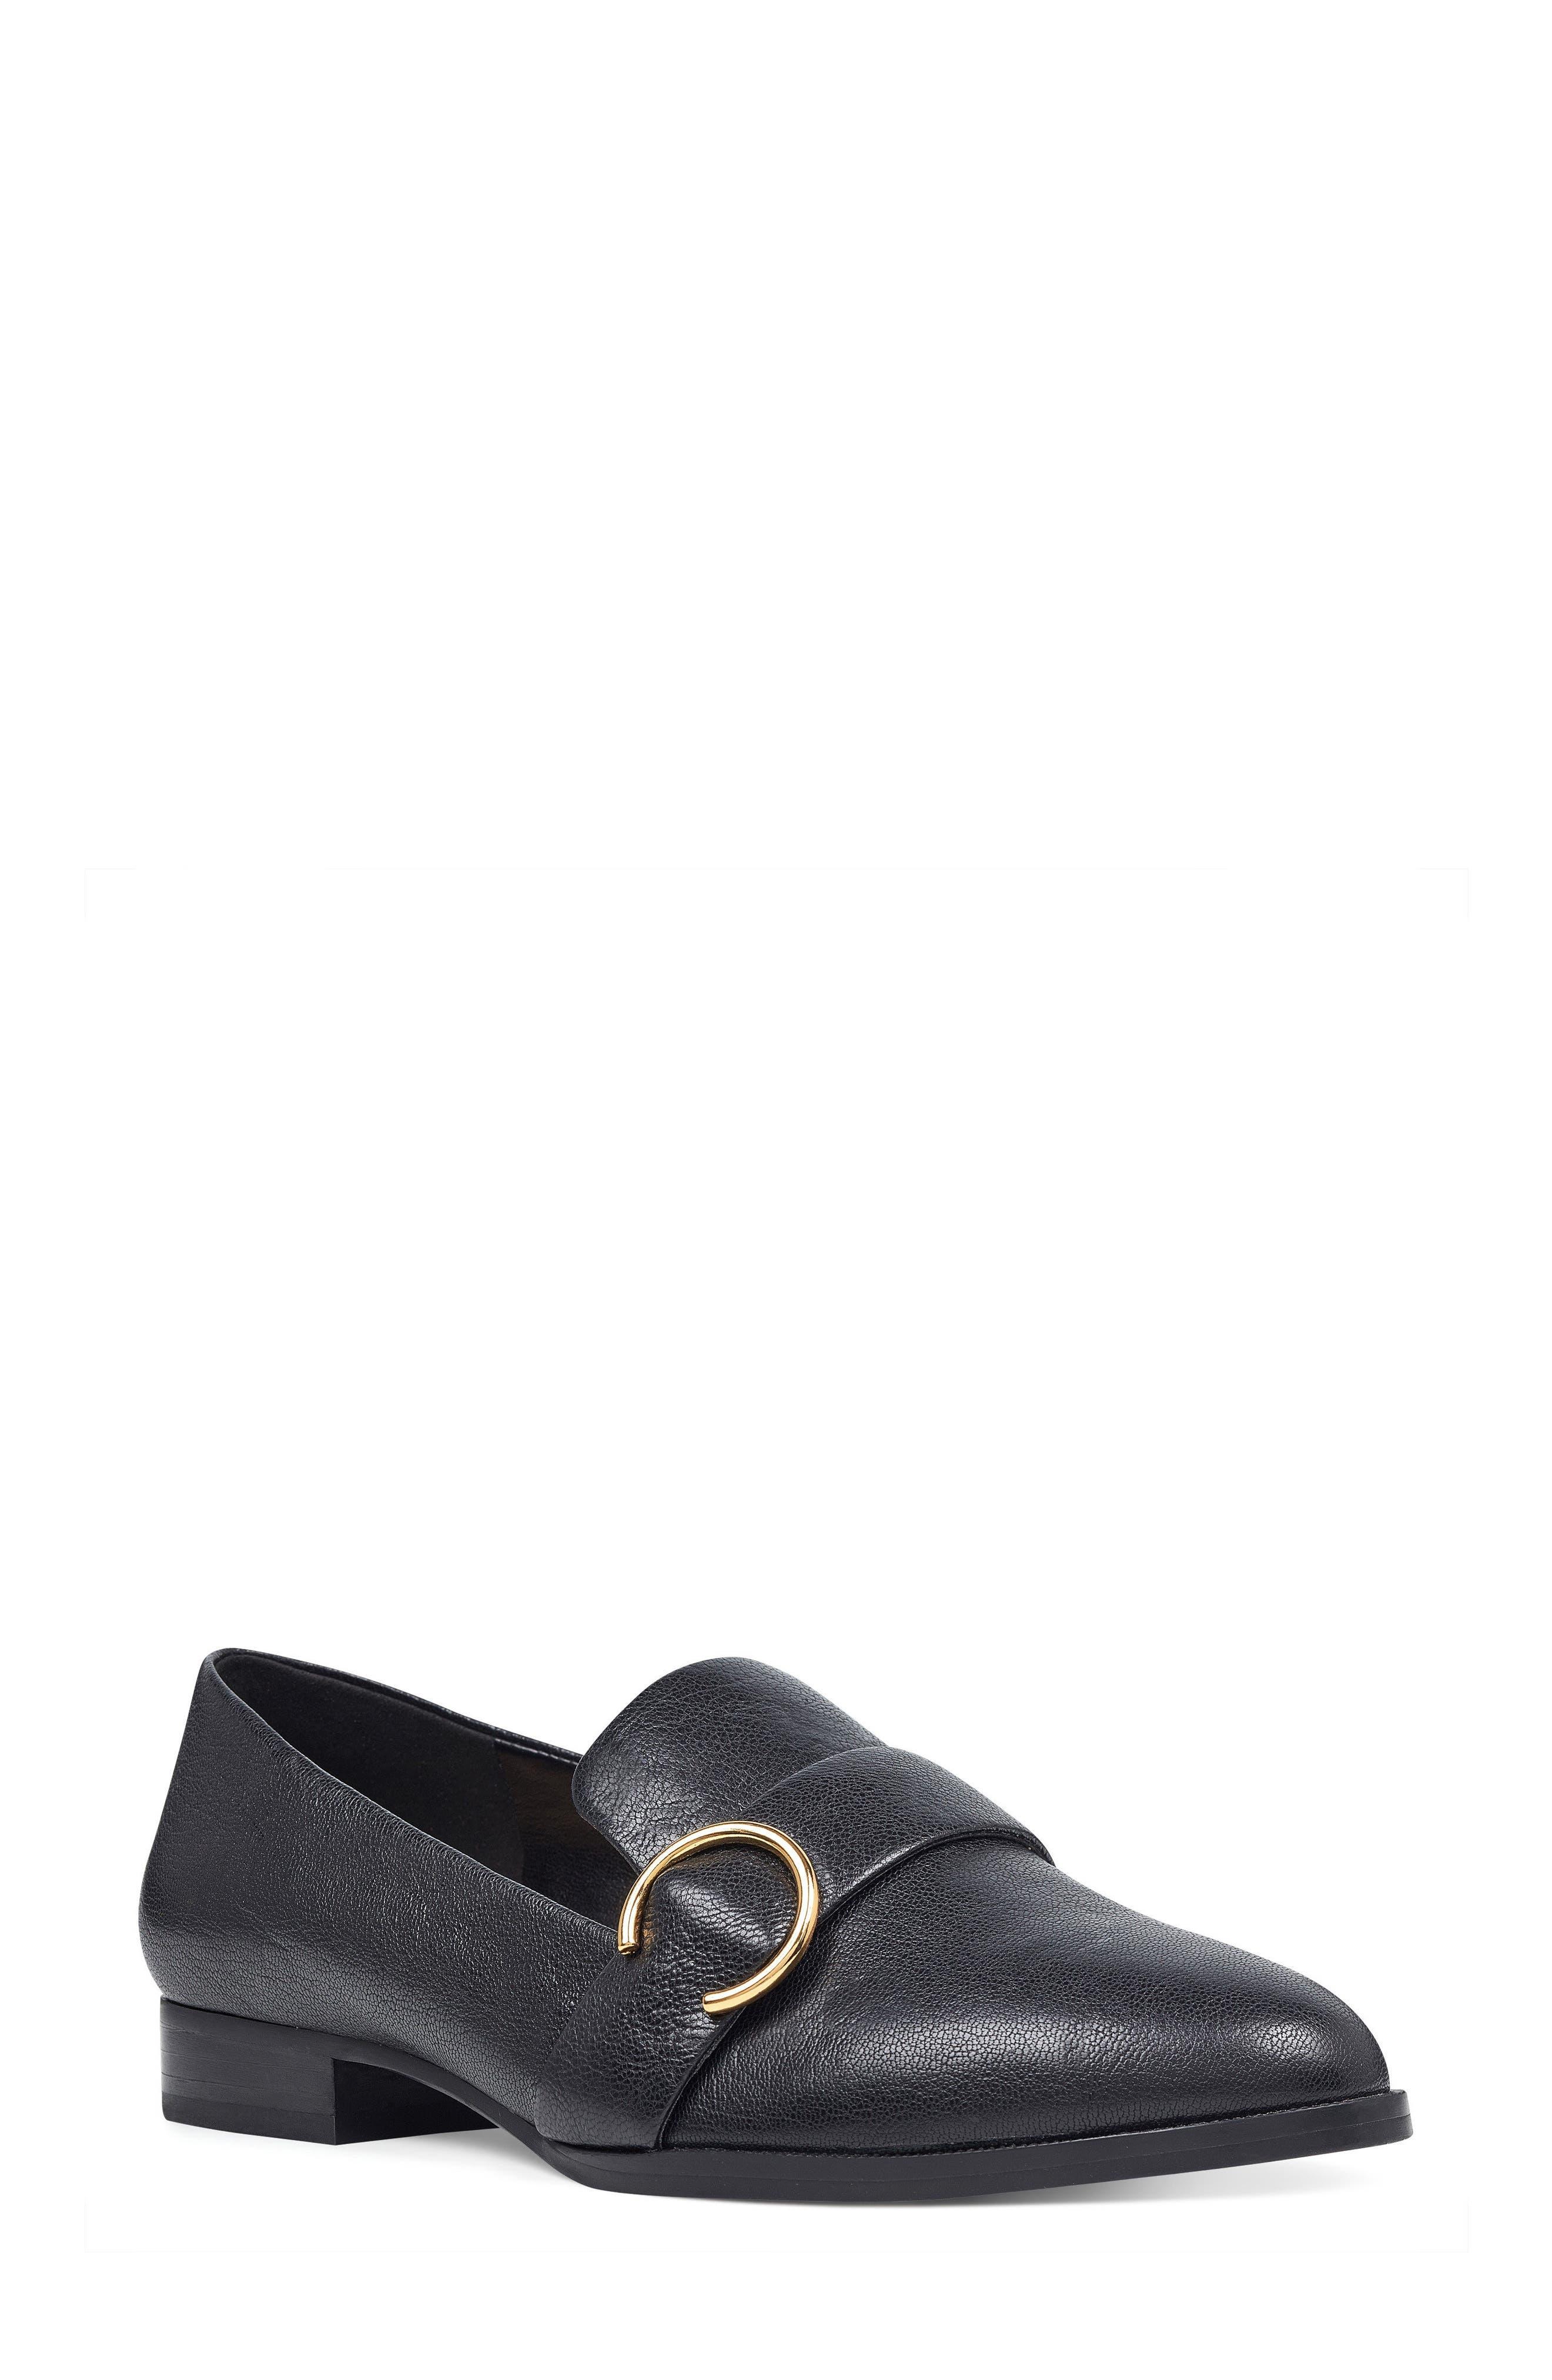 Huff Loafer Flat,                         Main,                         color, Black Leather